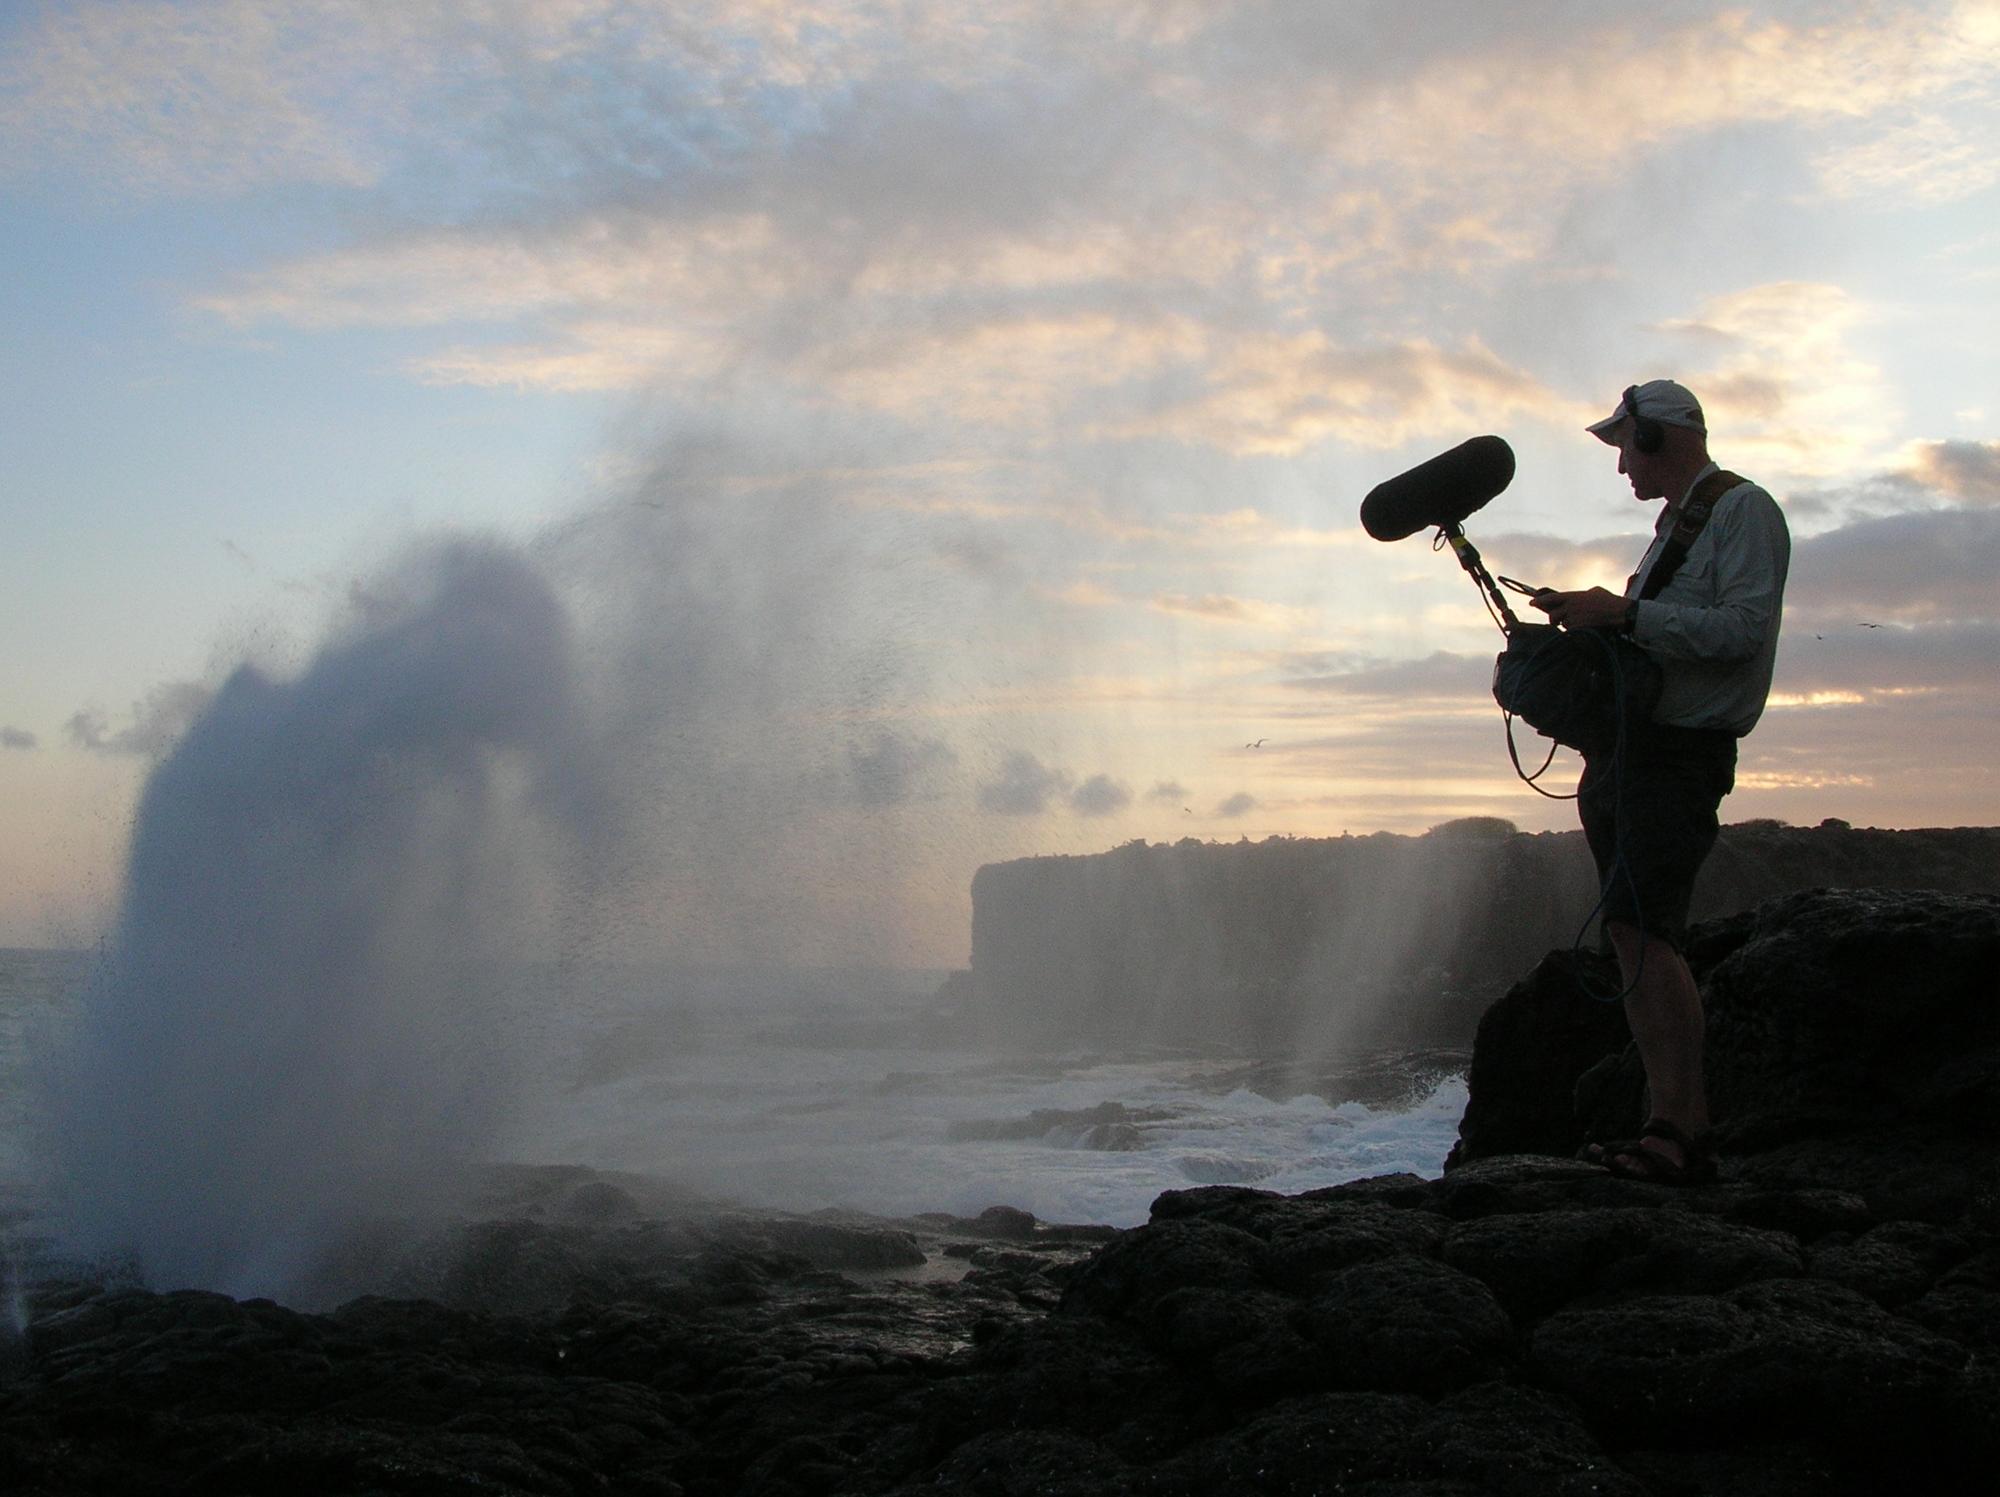 Diamond geyser: Watson on assignment recording the sounds of an erupting geyser.